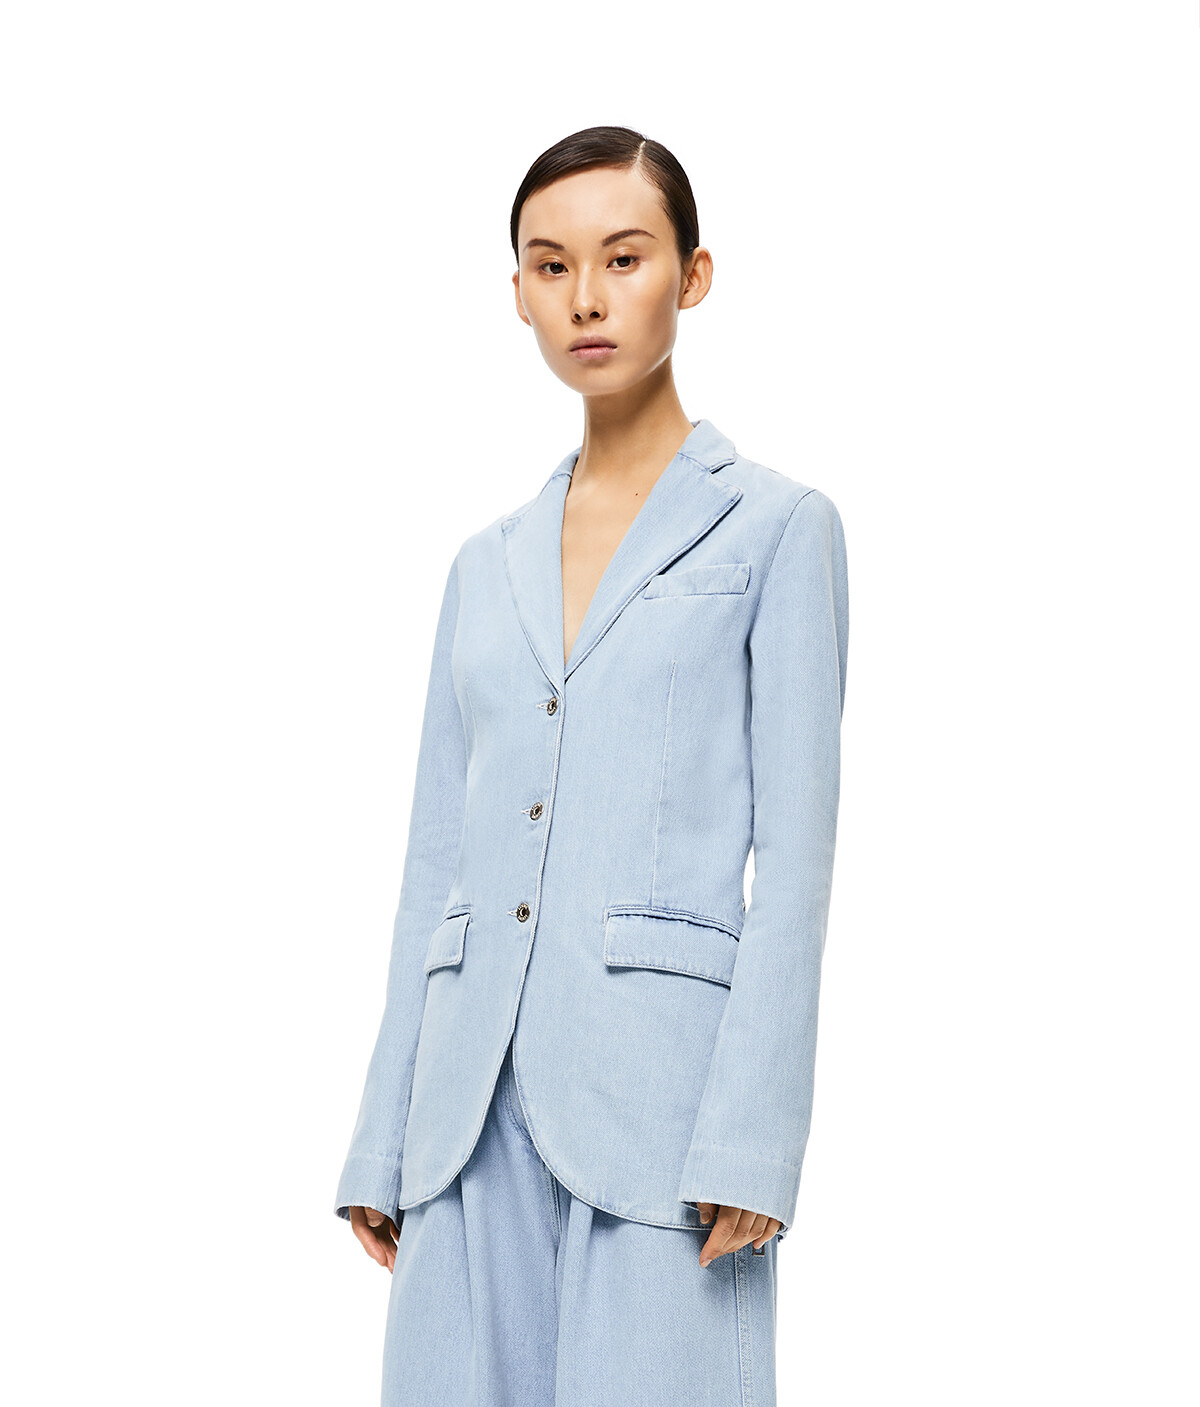 LOEWE Notch Lapel Denim Jacket Light Blue/White front